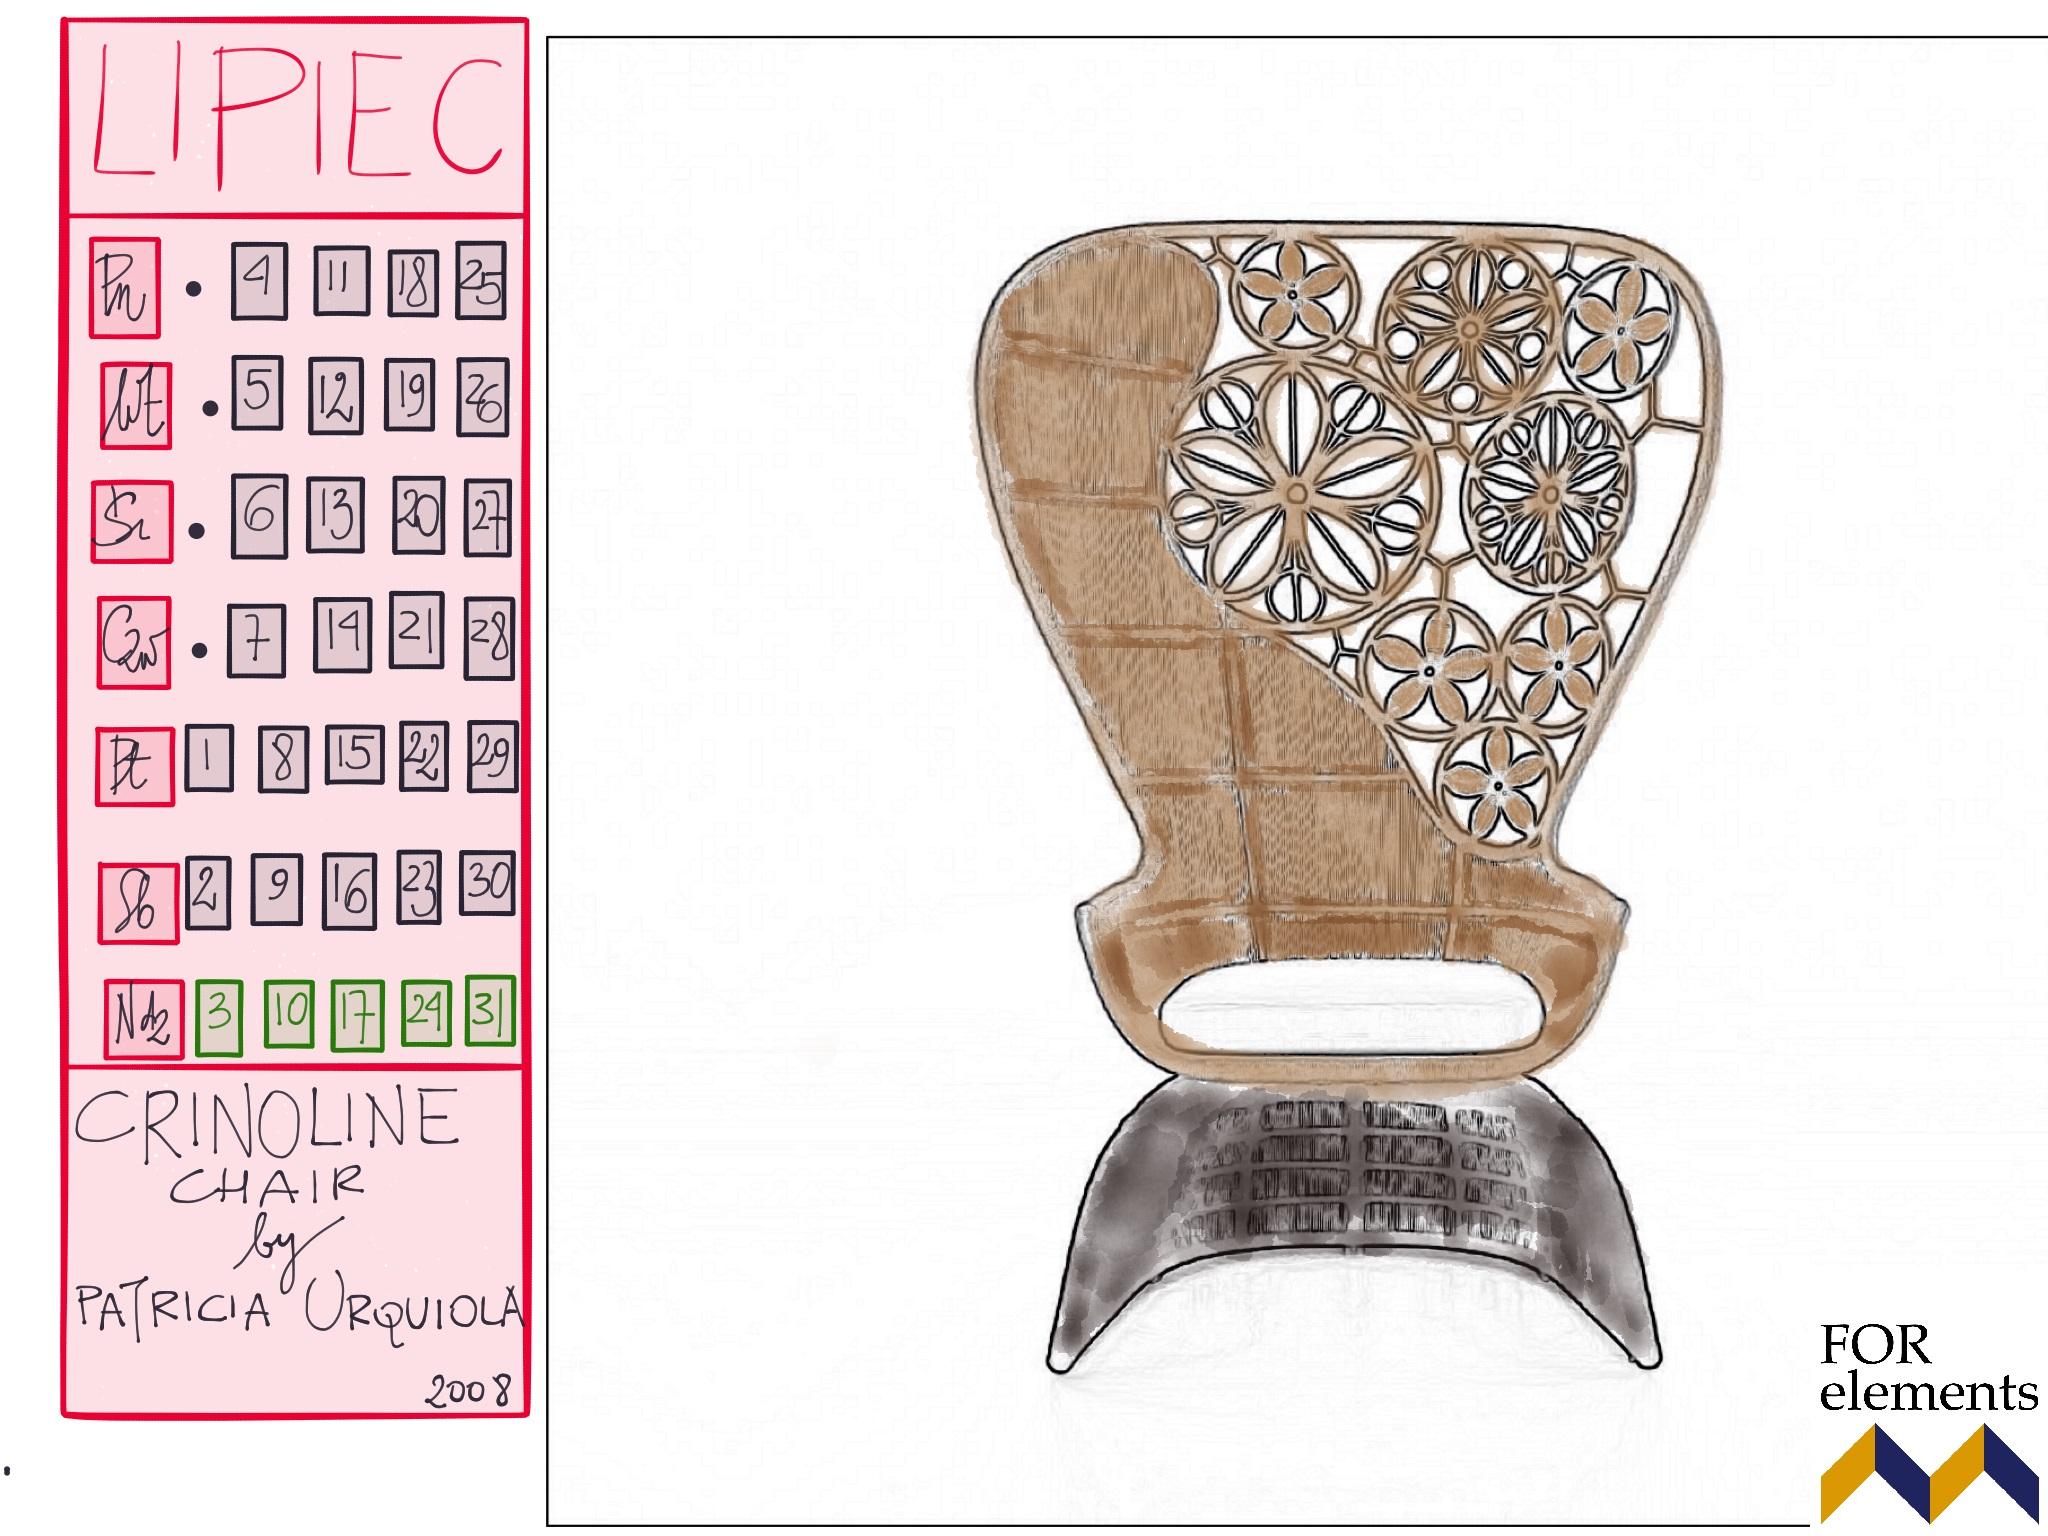 7 crinoline_chair_patricia_urquiola_bb_italia_calendar_2016_design_icons_furniture_interior_ideas_home_decorationg_forelements_blog